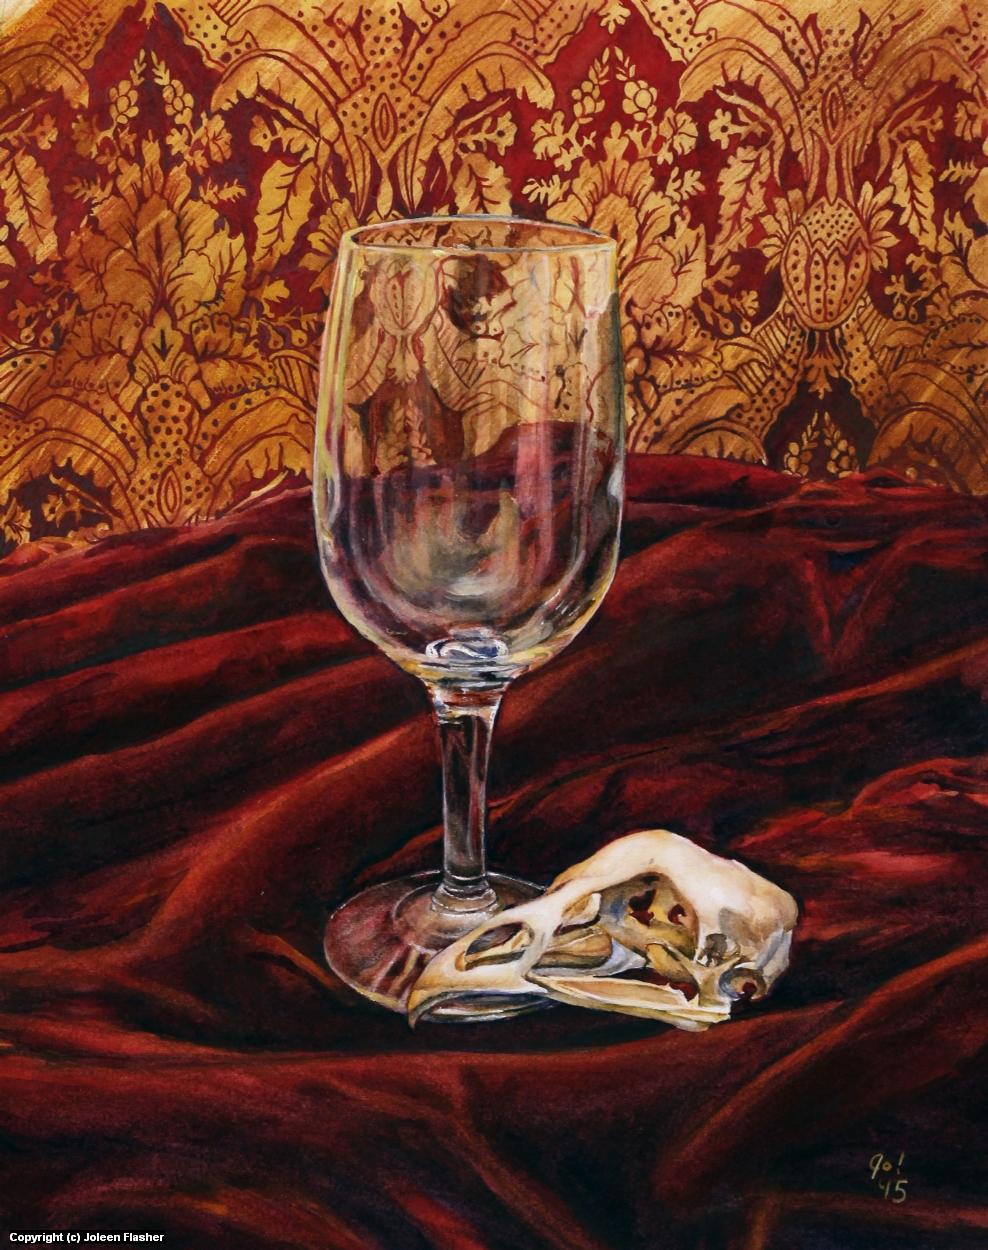 Glass & Bone Artwork by Joleen Flasher